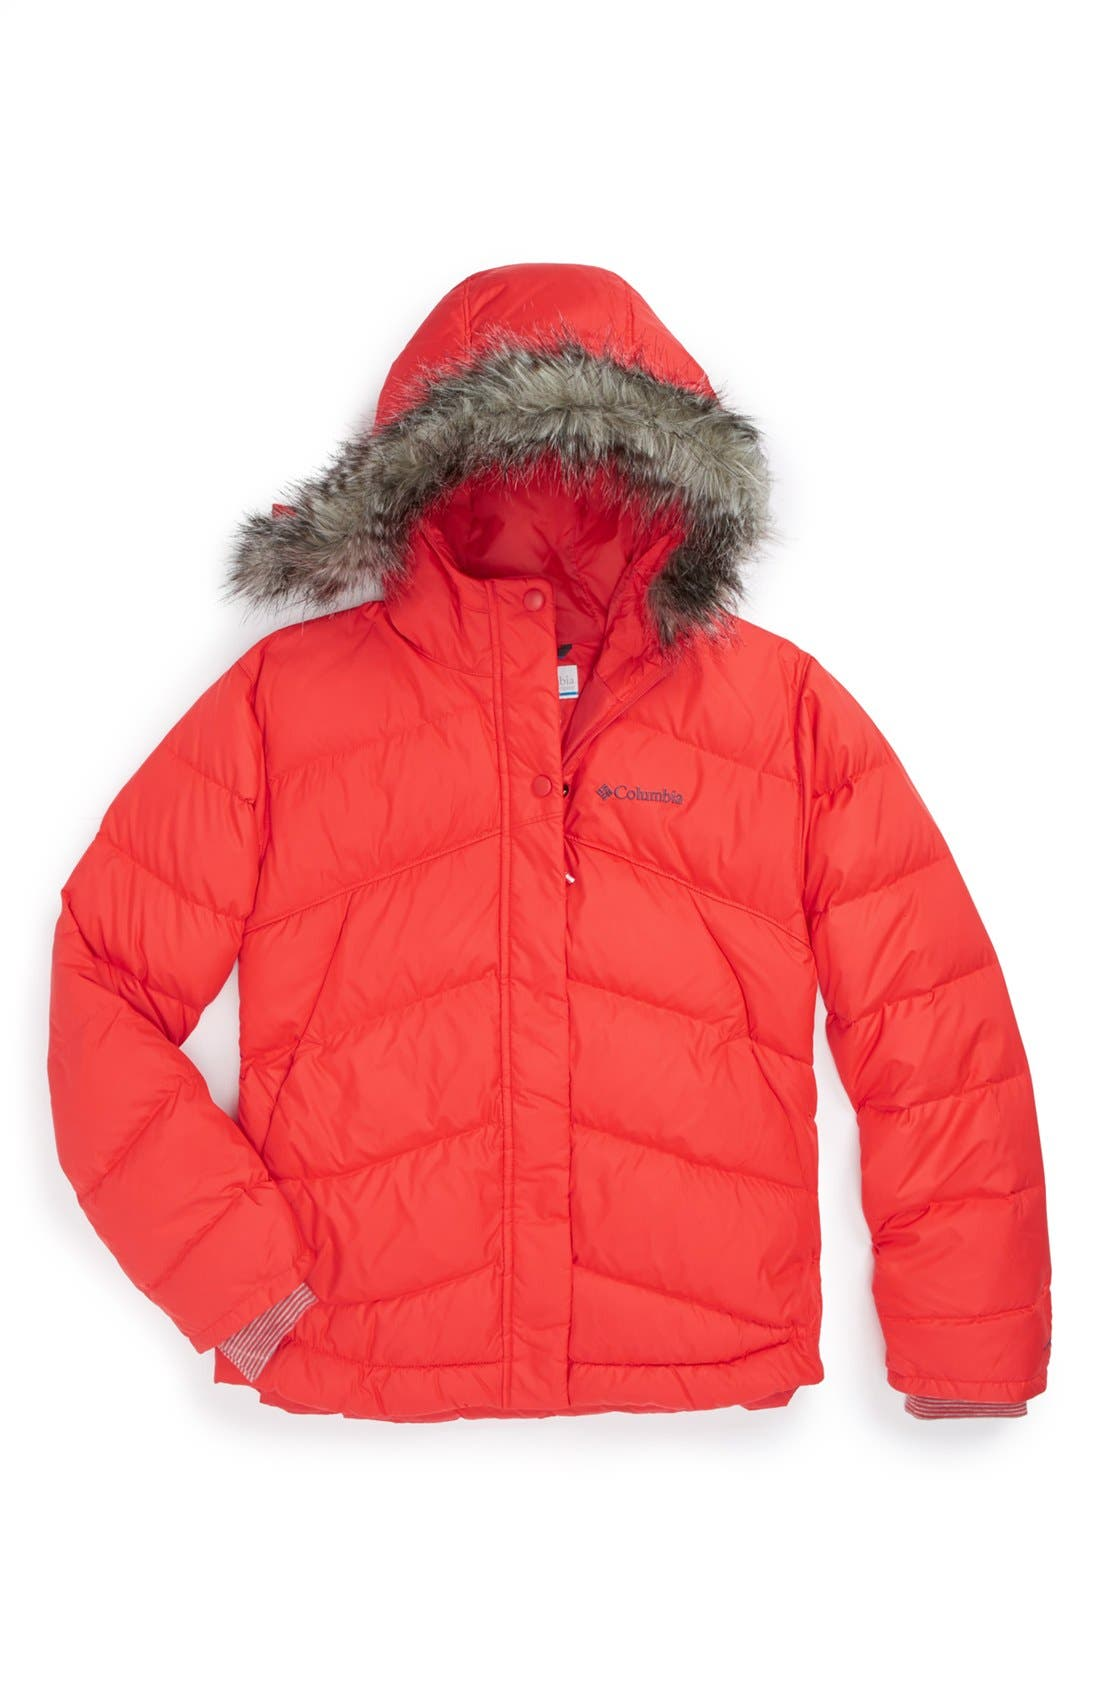 Main Image - Columbia 'Alpine Glow' Jacket (Big Girls)